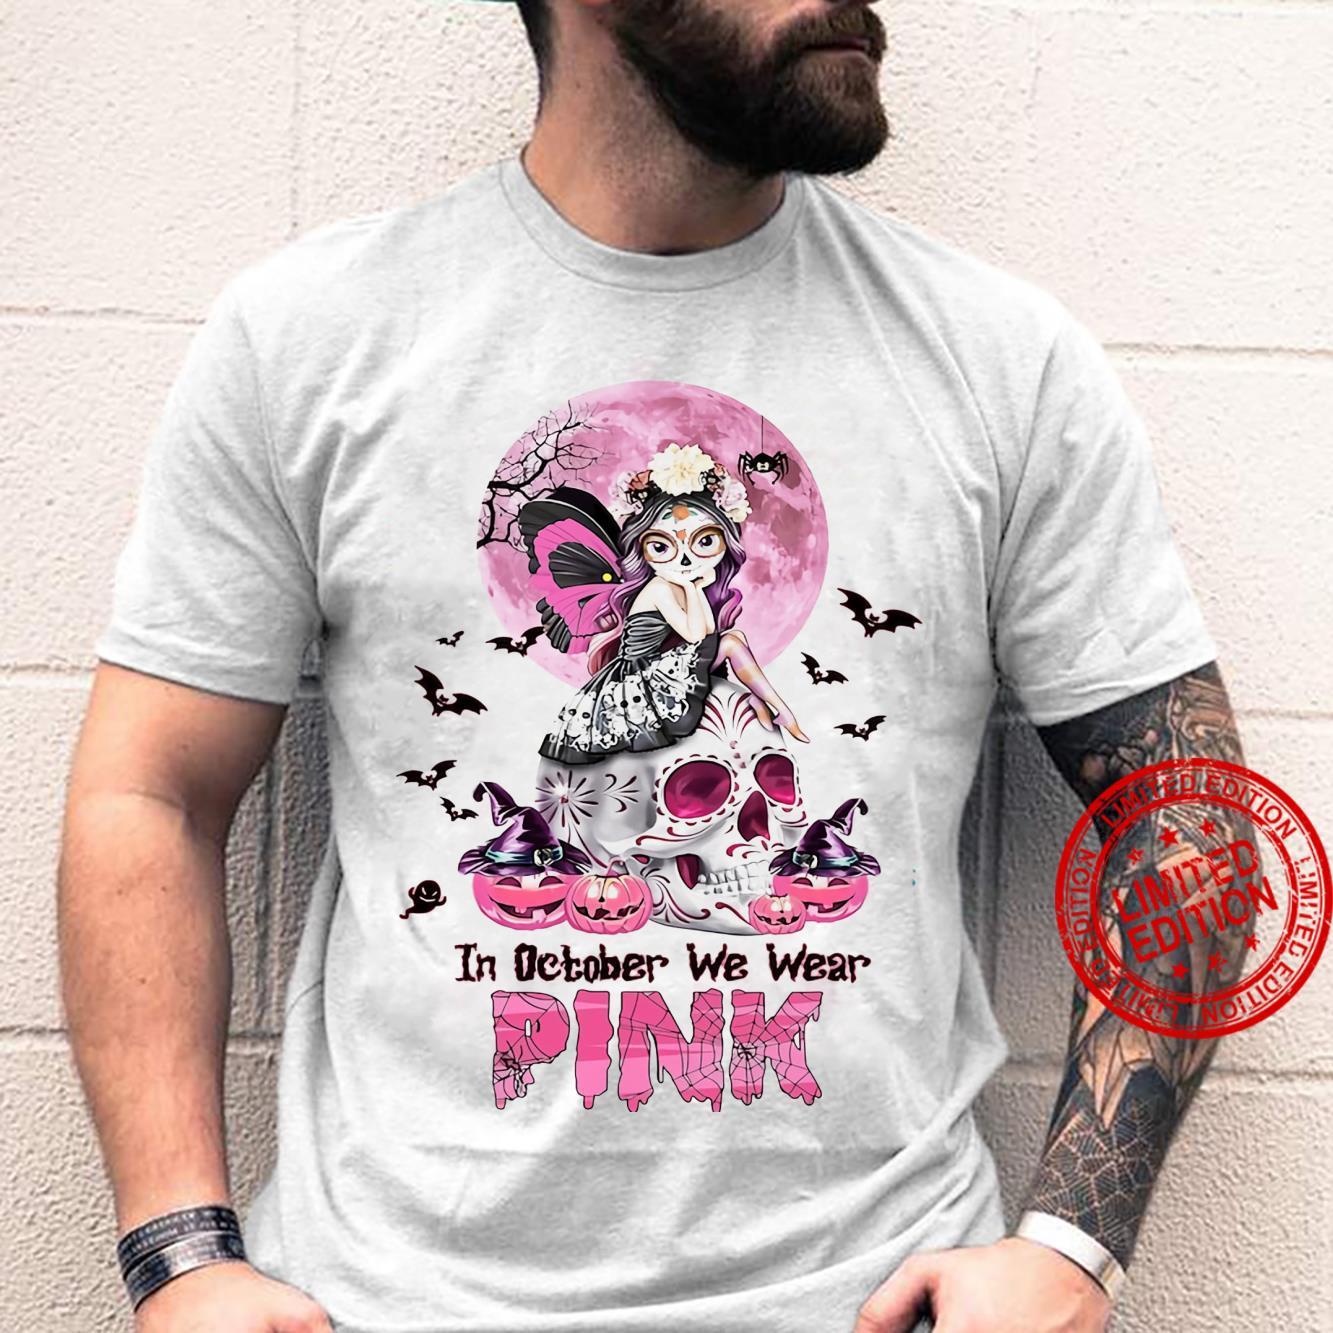 In October We Wear Pink Shirt unisex